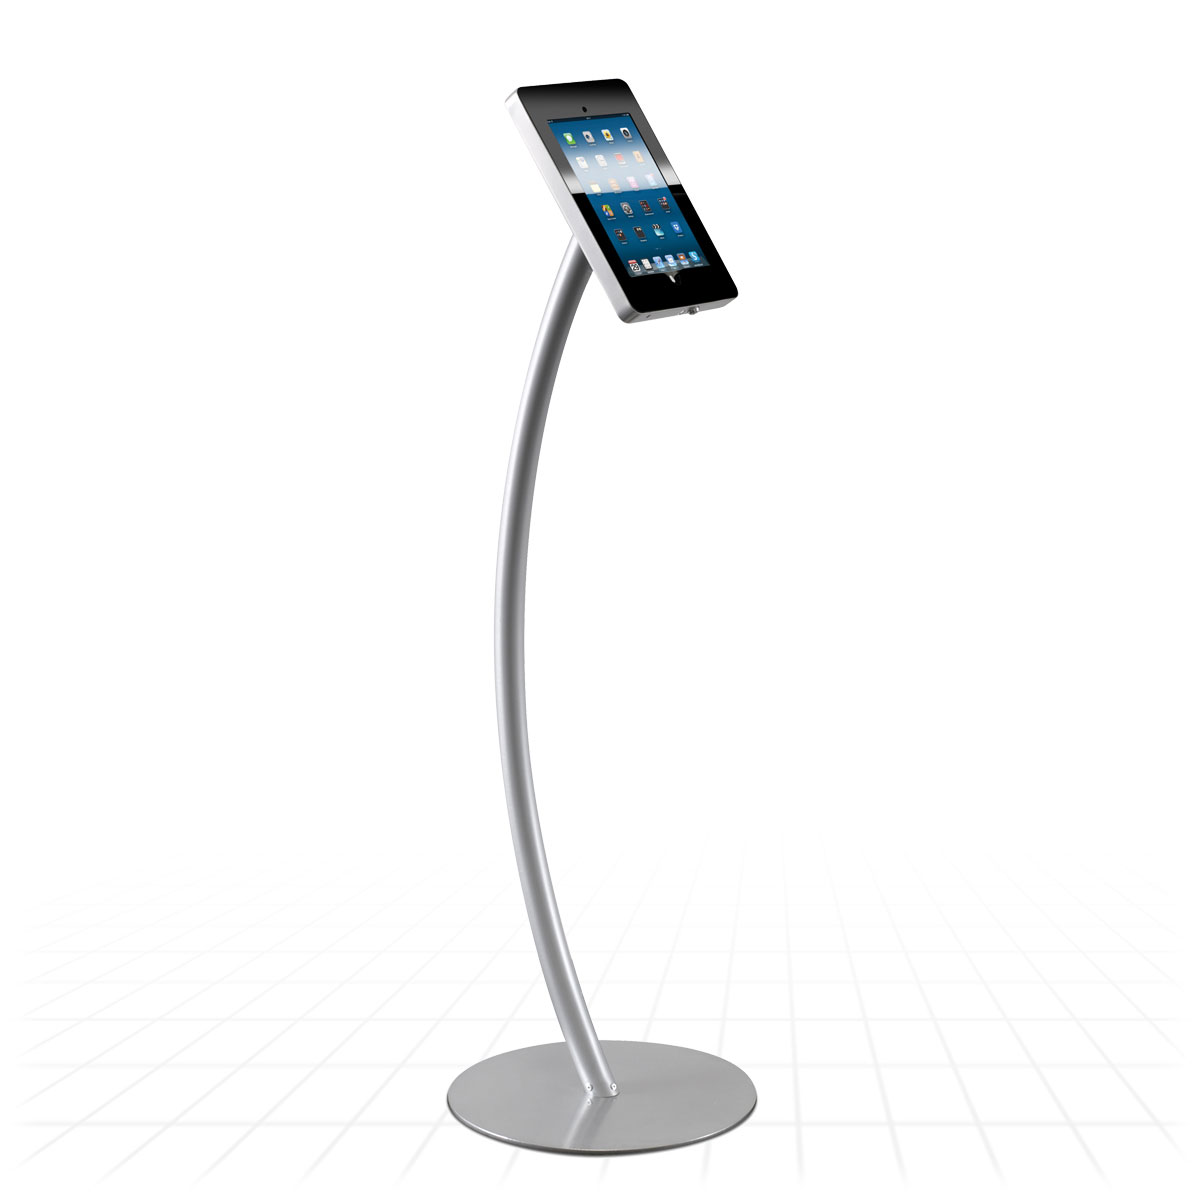 Zeus Exhibition Stand : Curve ipad display stand tablet stands